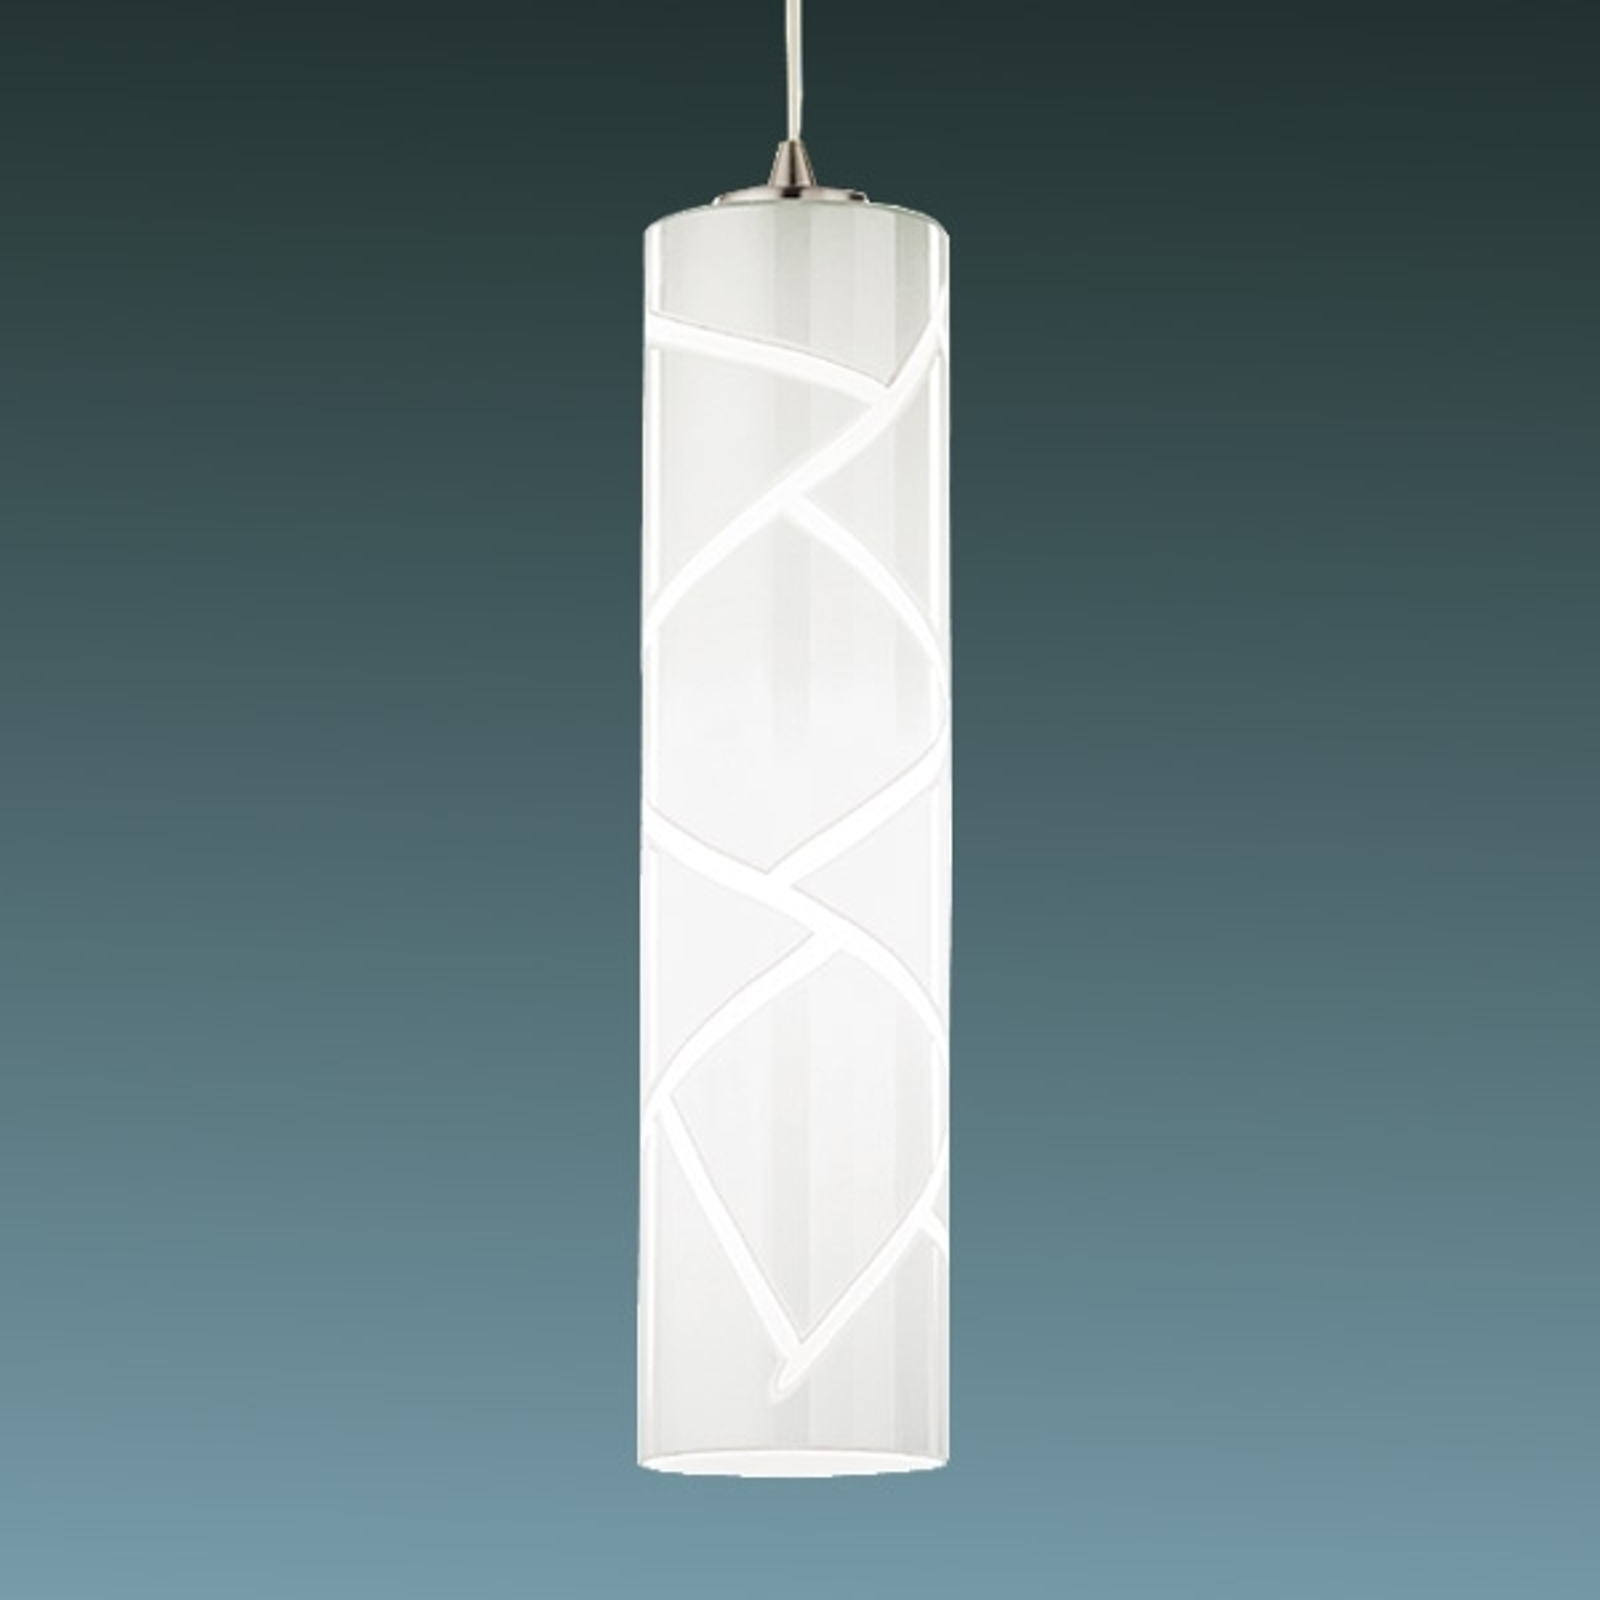 Boheme - artistieke hanglamp, 1-lichts